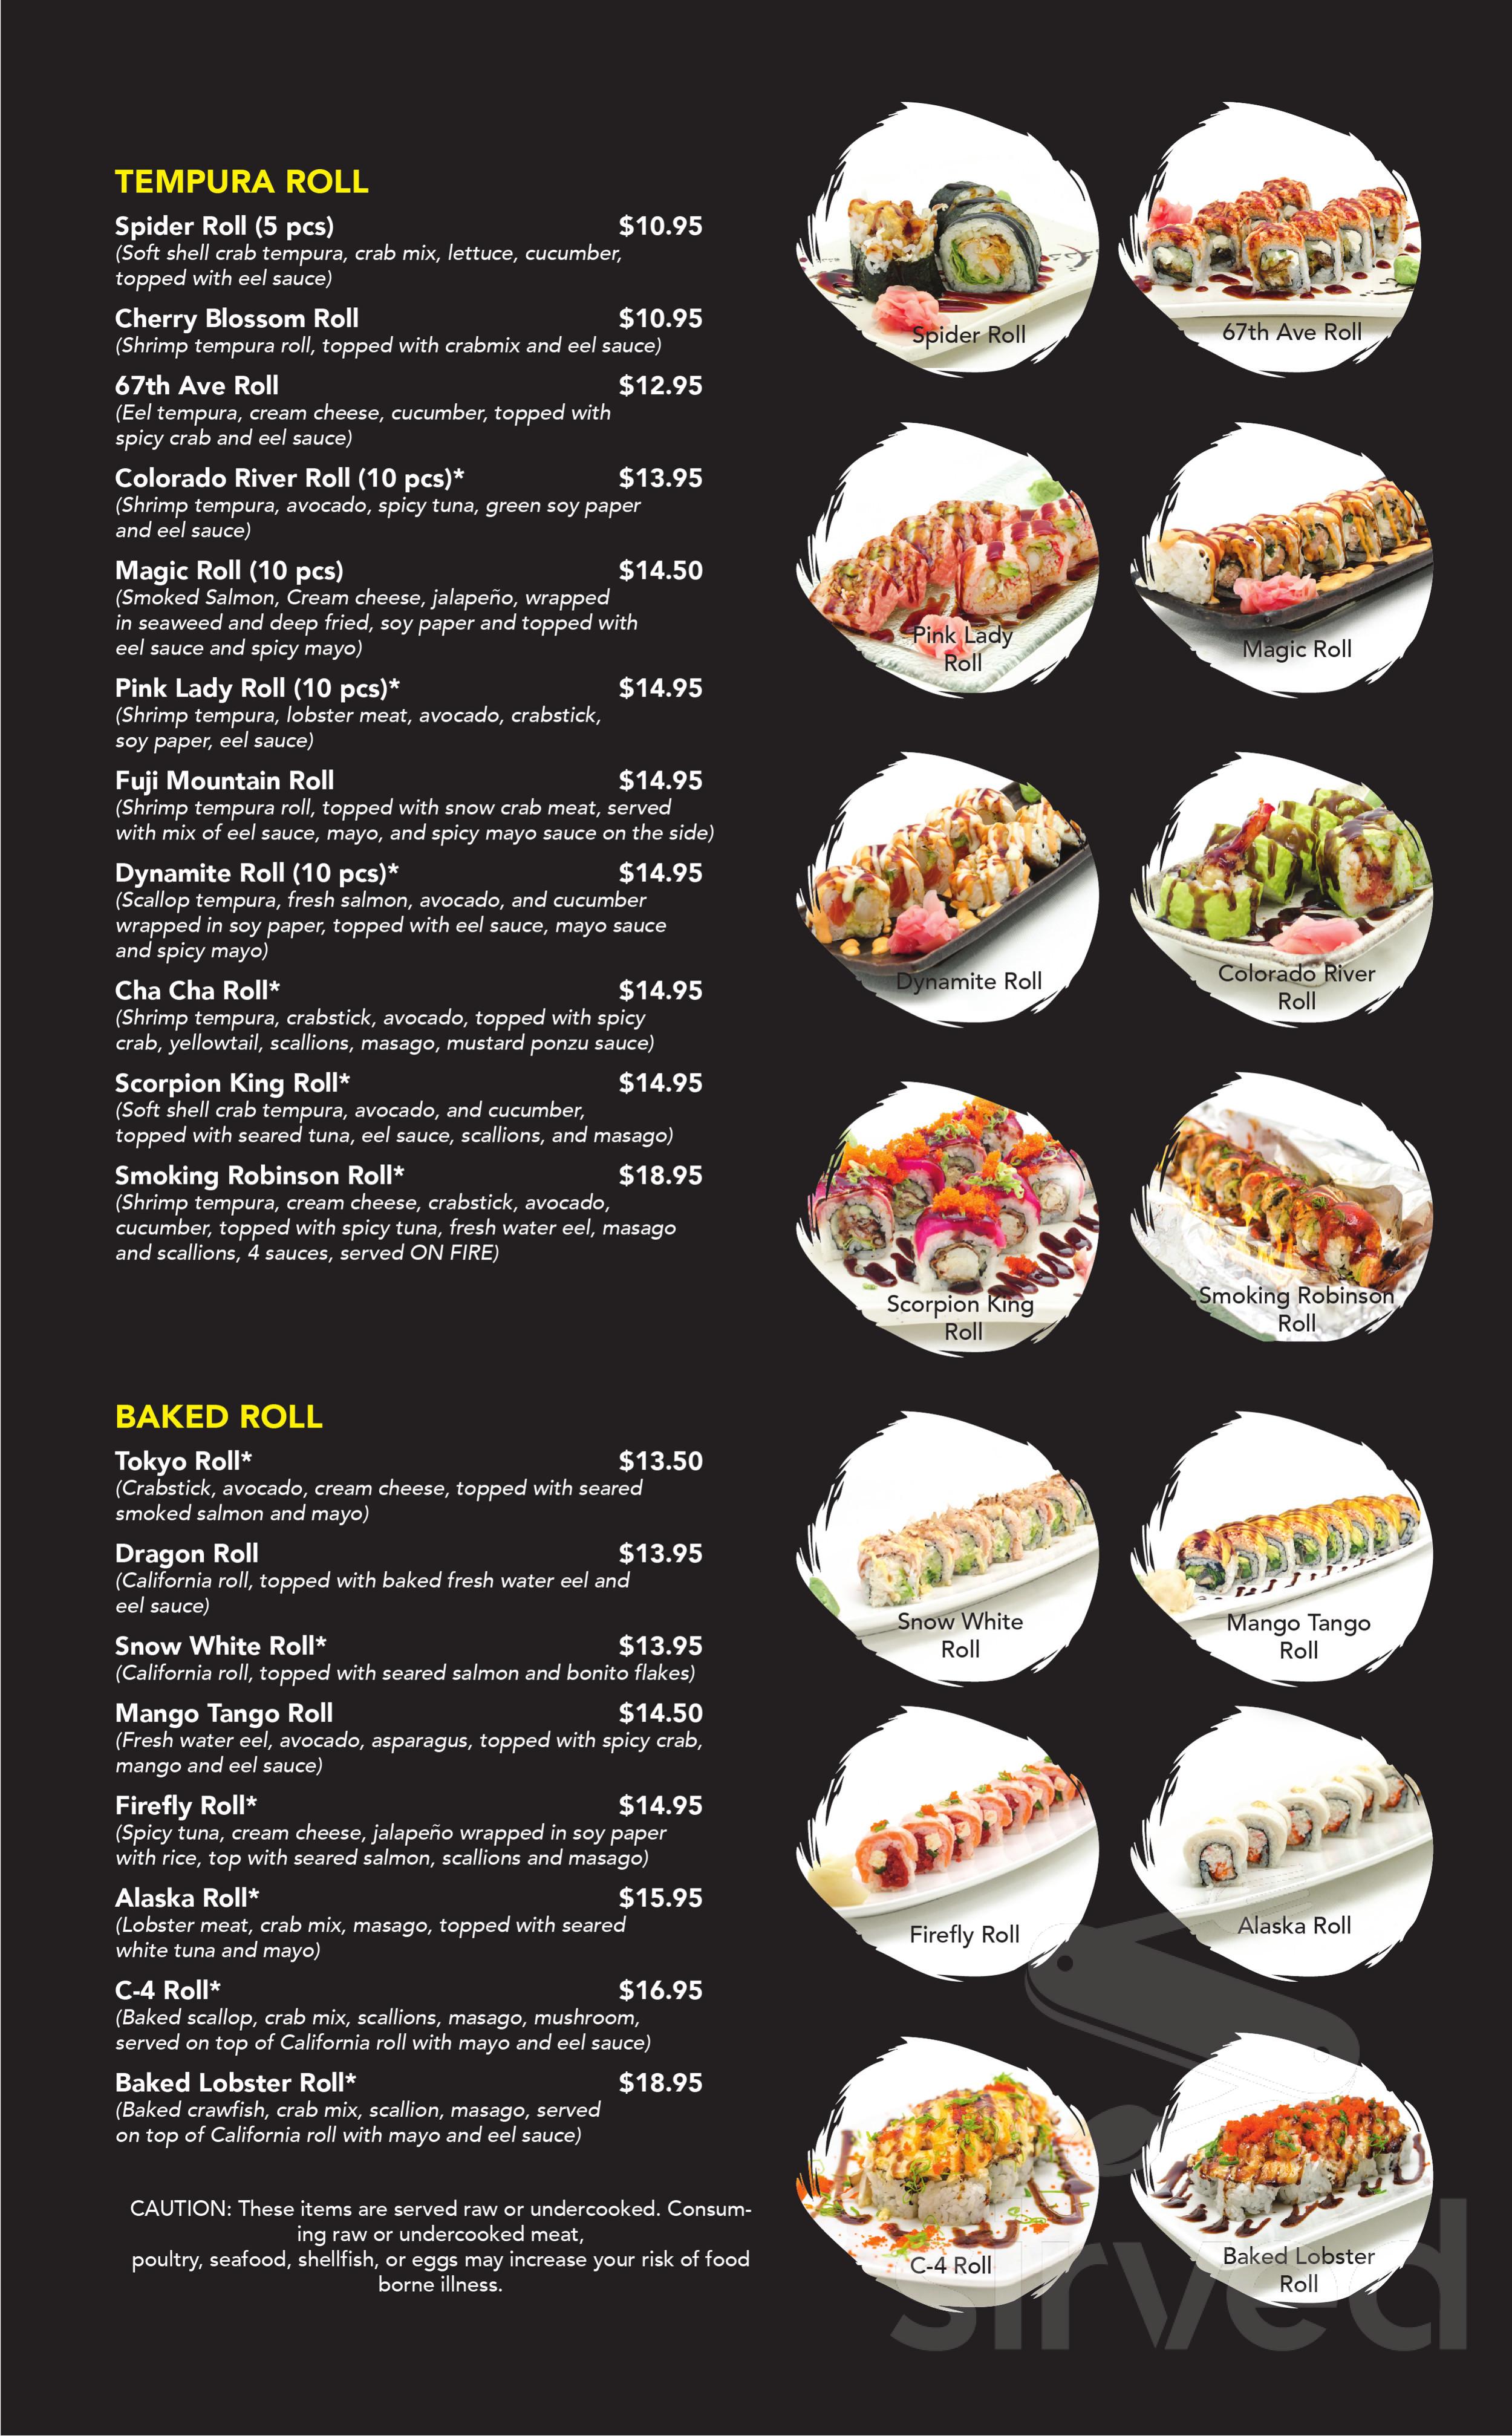 Menu for Kawaii Sushi and Asian Cuisine in Glendale, Arizona